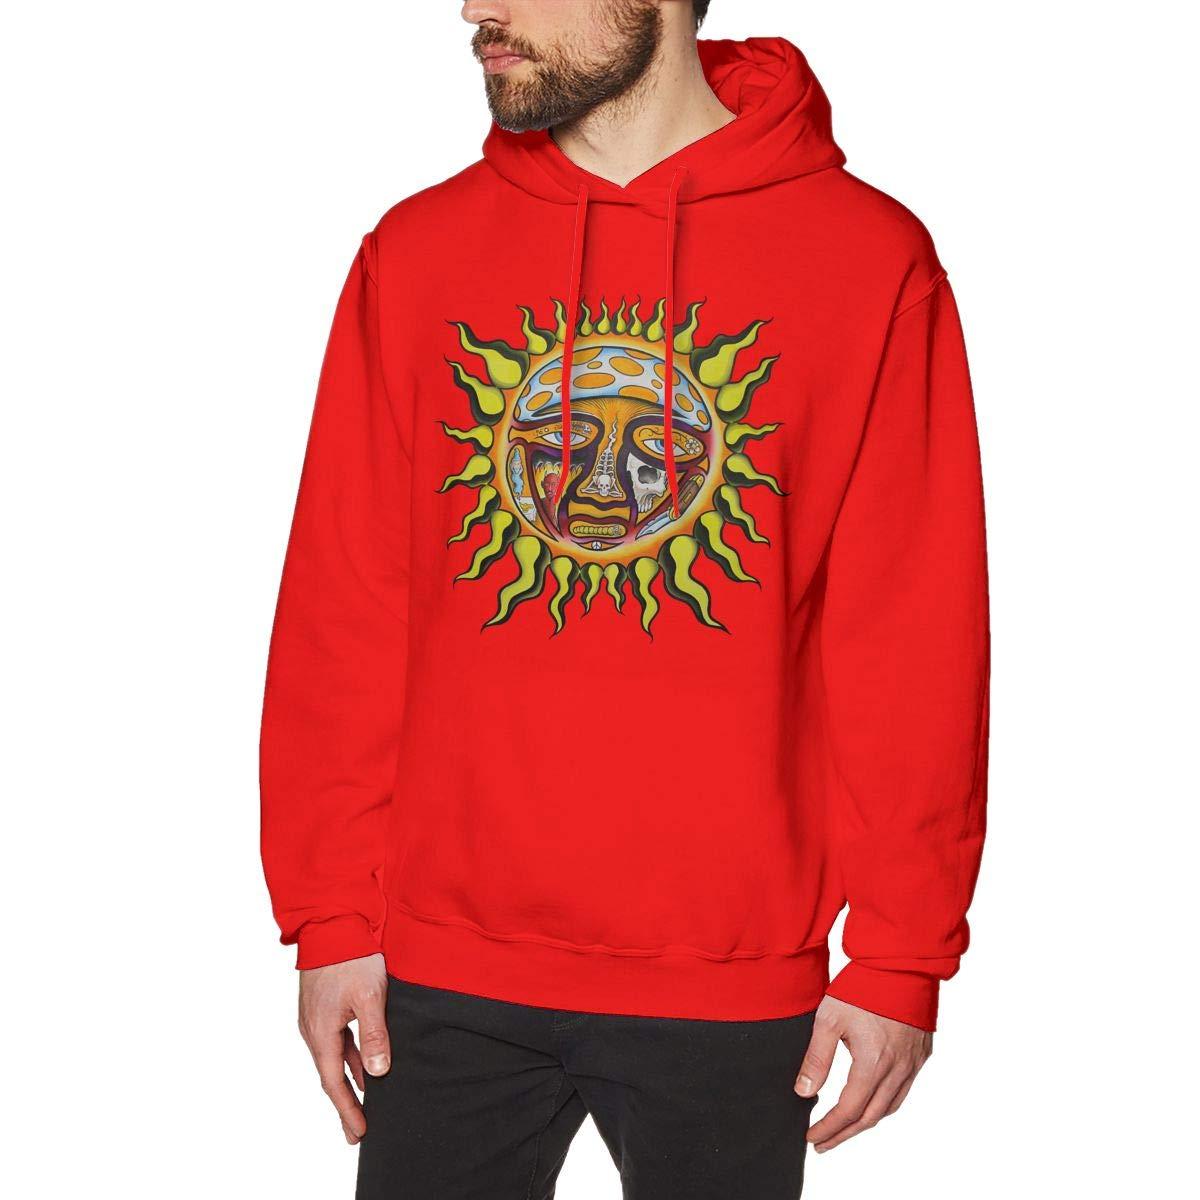 The Story of Sublimes Iconic Sun Logo Men's Hooded Sweatshirt